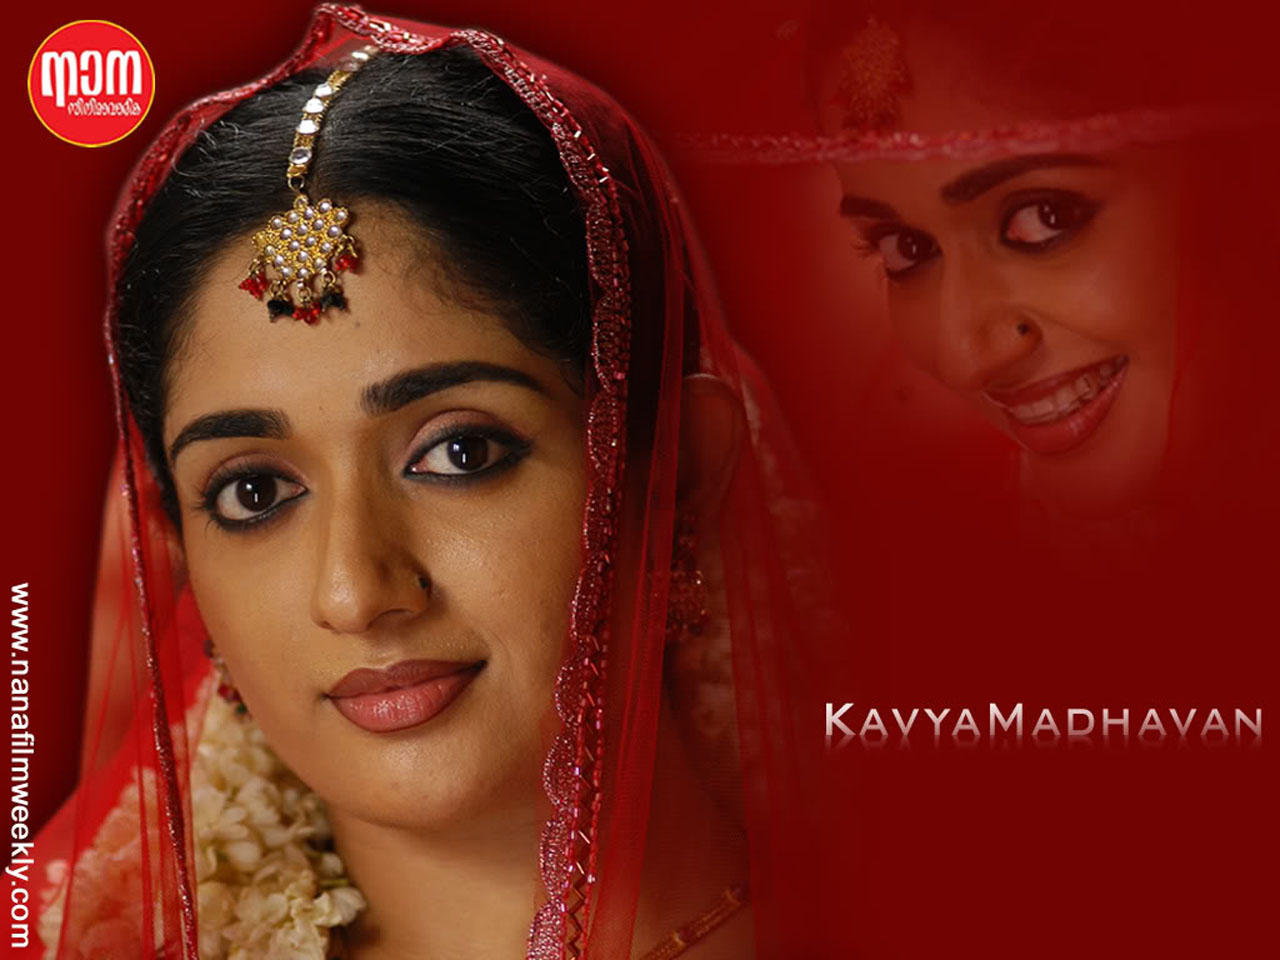 kavya madhavan bridal wallpaper View All View All